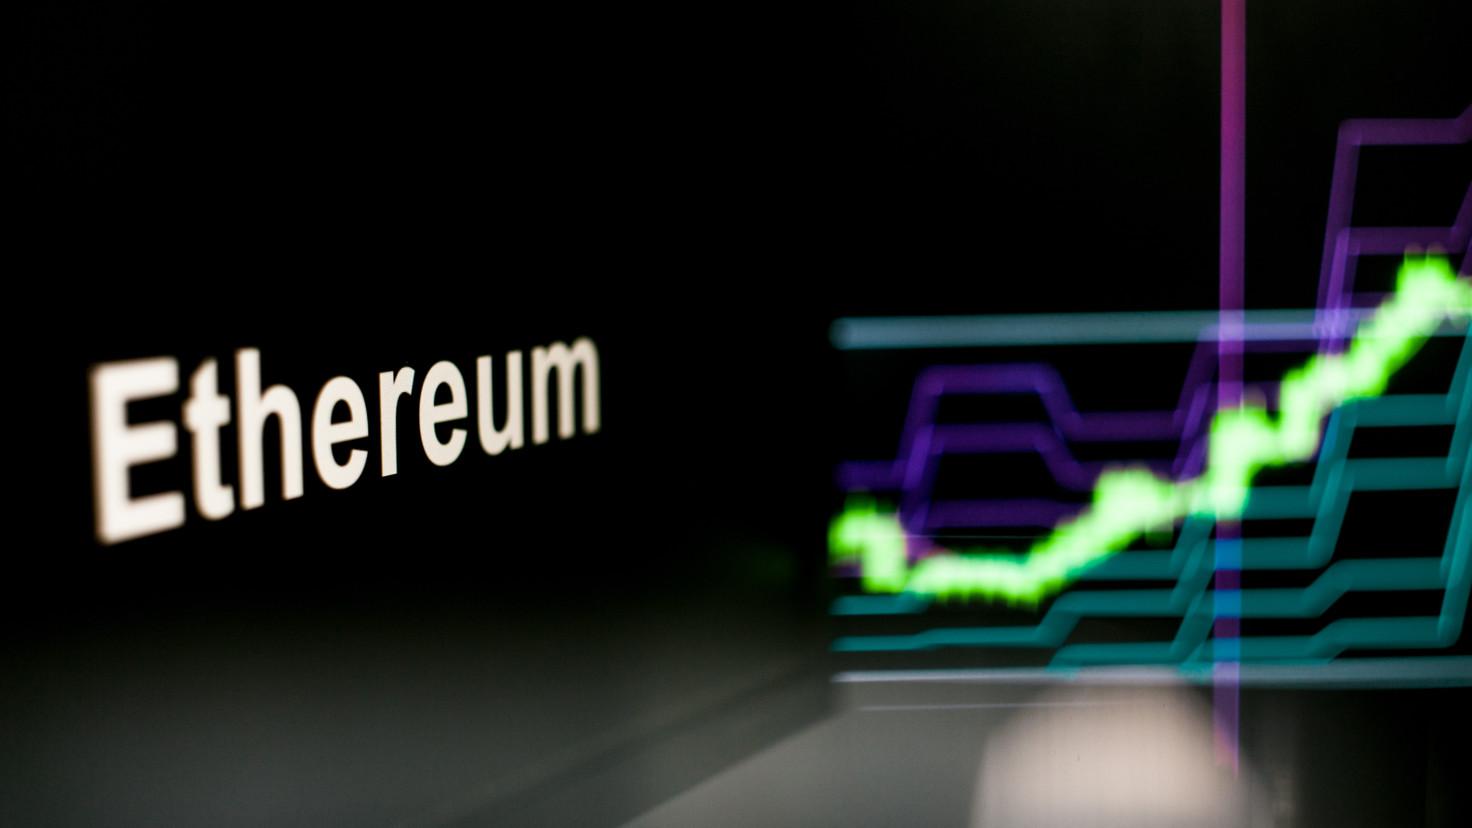 Ether и Ethereum: в чем разница